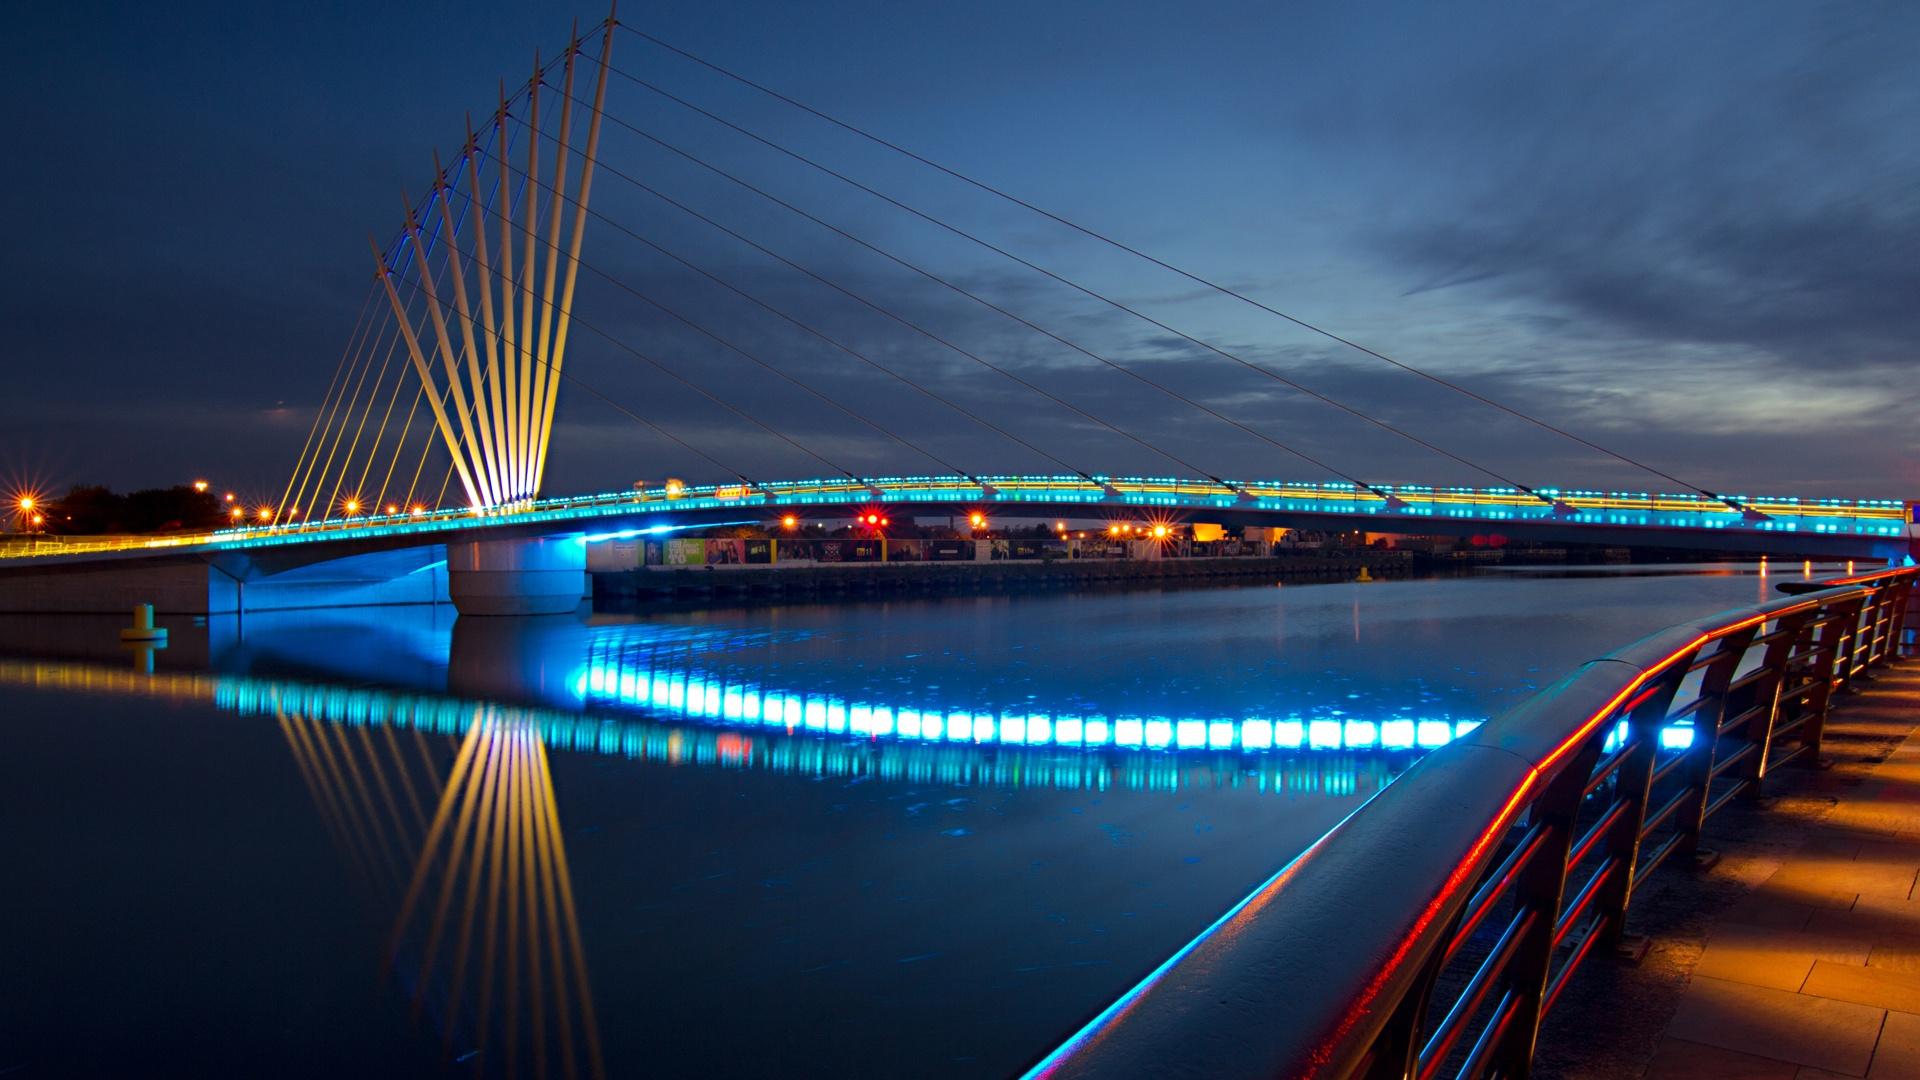 City Night Bridge Lights The Promenade Wallpapers   1920x1080   588624 1920x1080